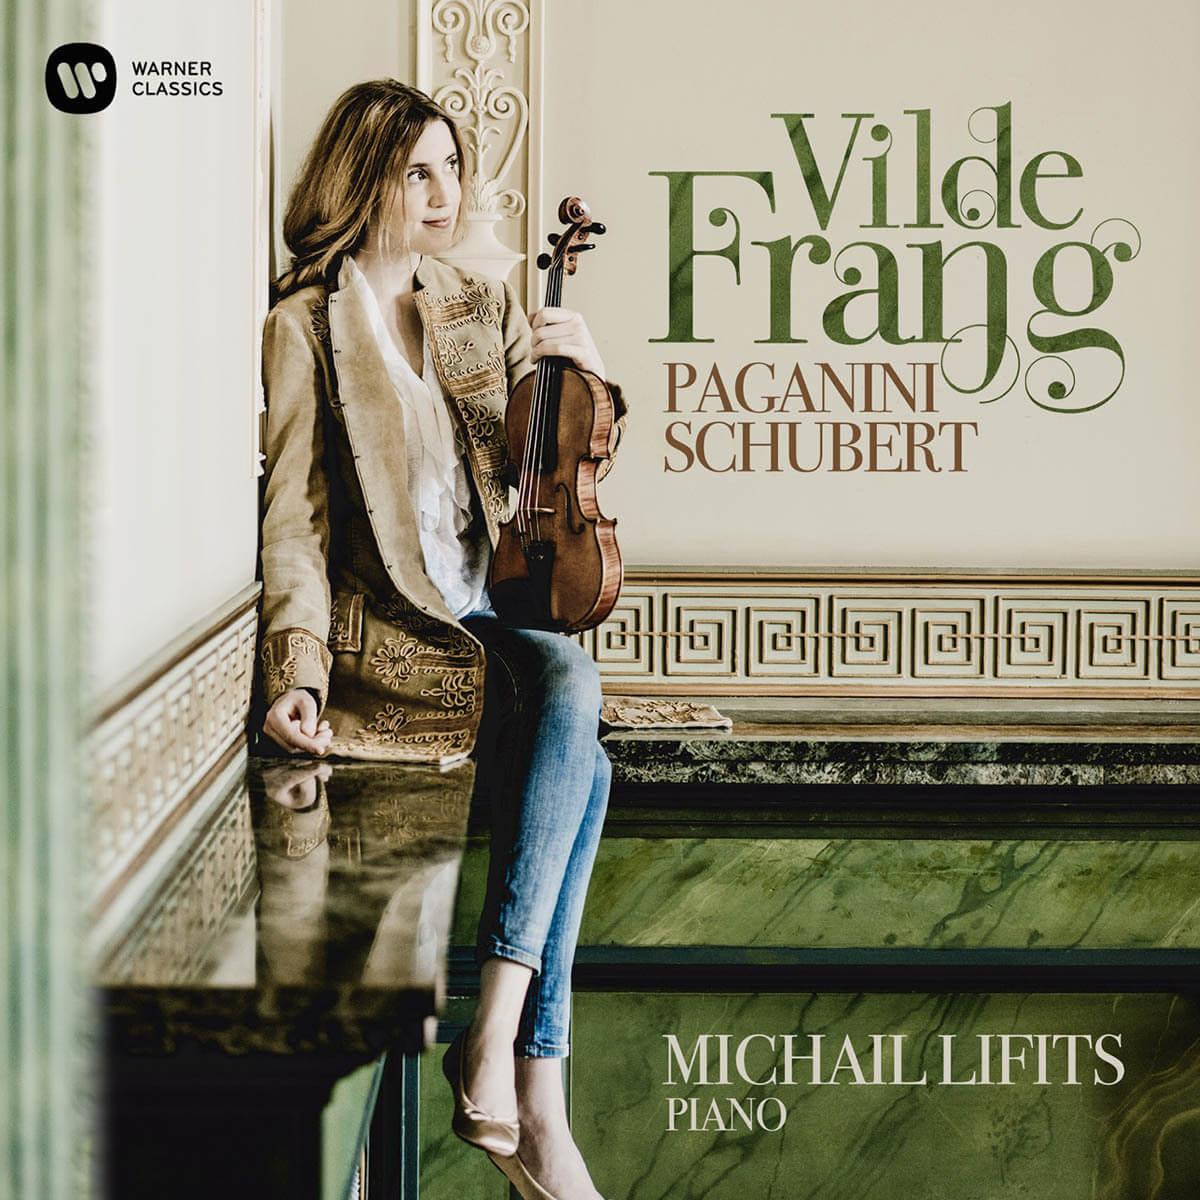 Vilde Frang: Paganini & Schubert